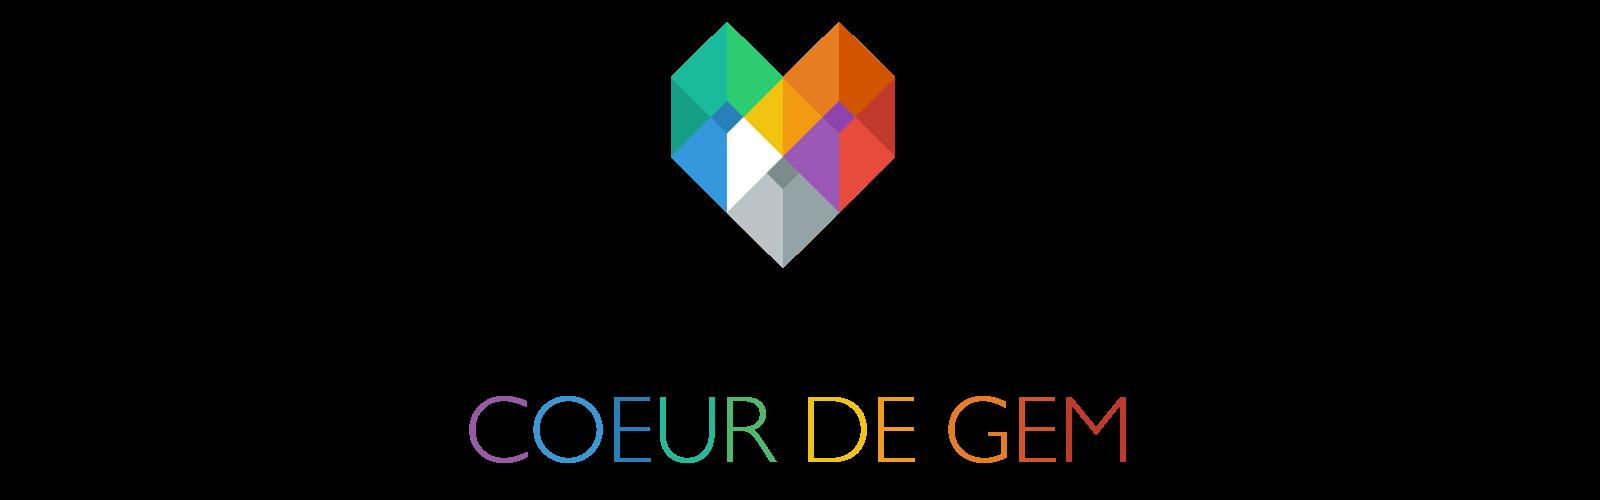 Le logo de Coeur de Gem